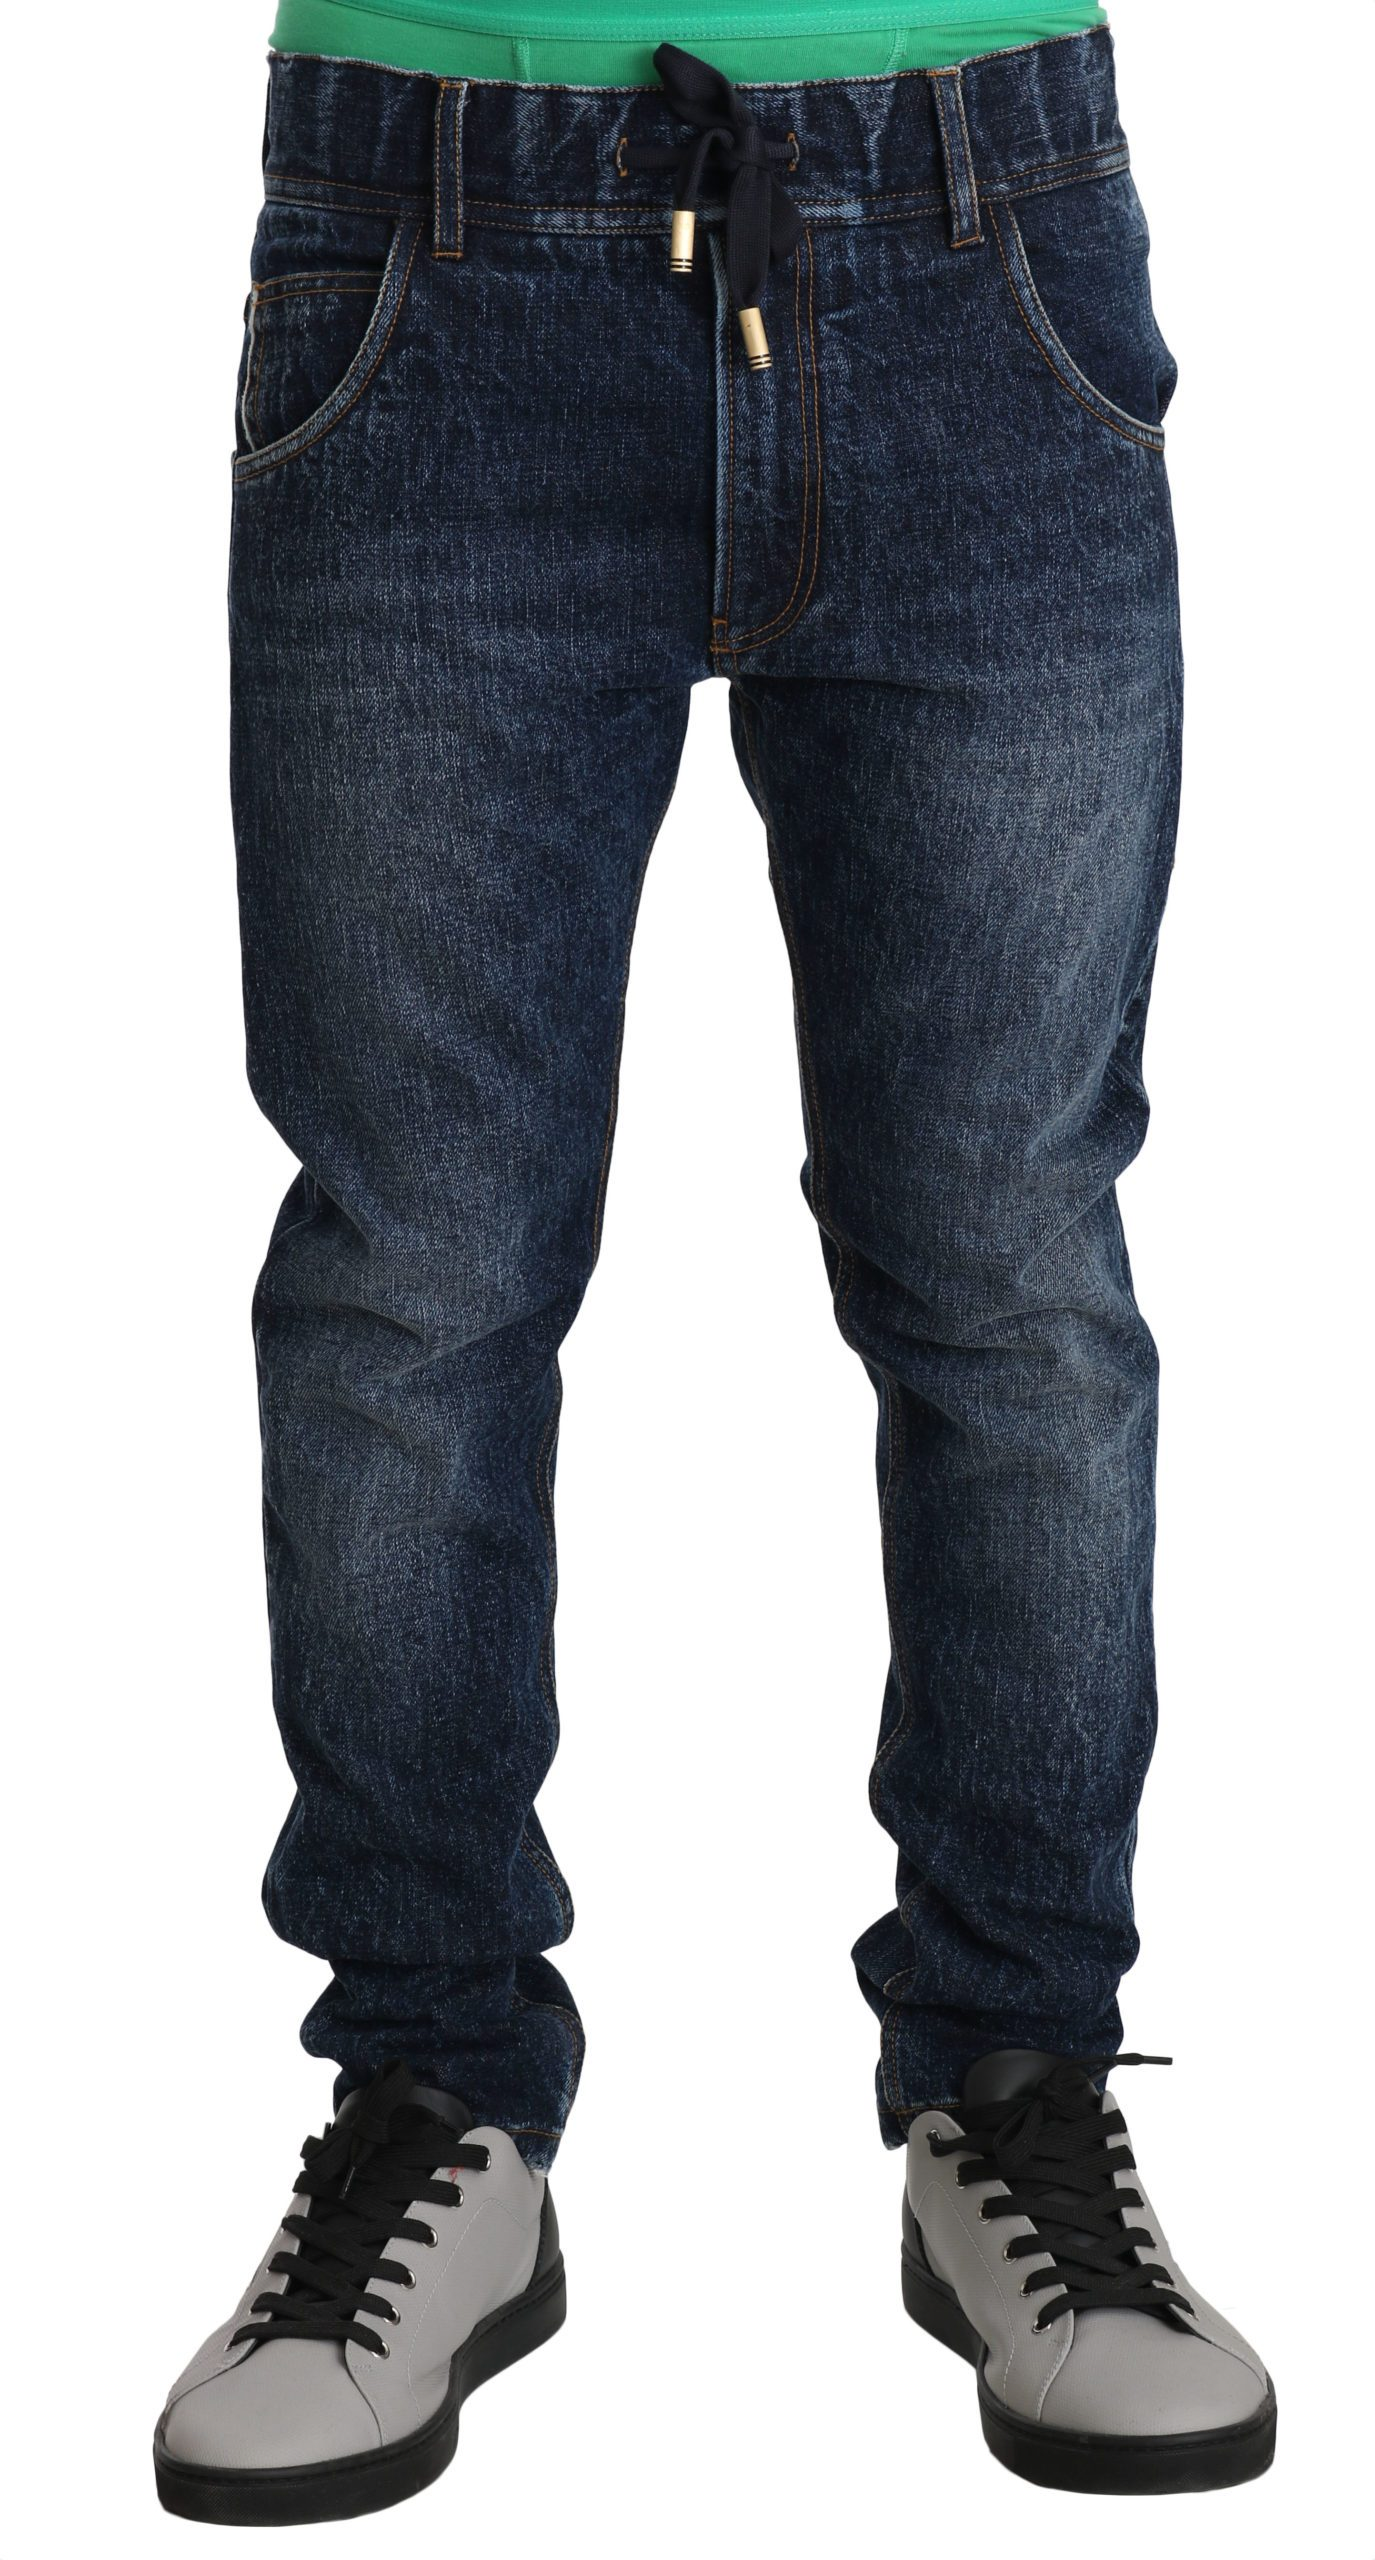 Dolce & Gabbana Men's Washed Slim Cotton Jeans Blue PAN70753 - IT44 | XS